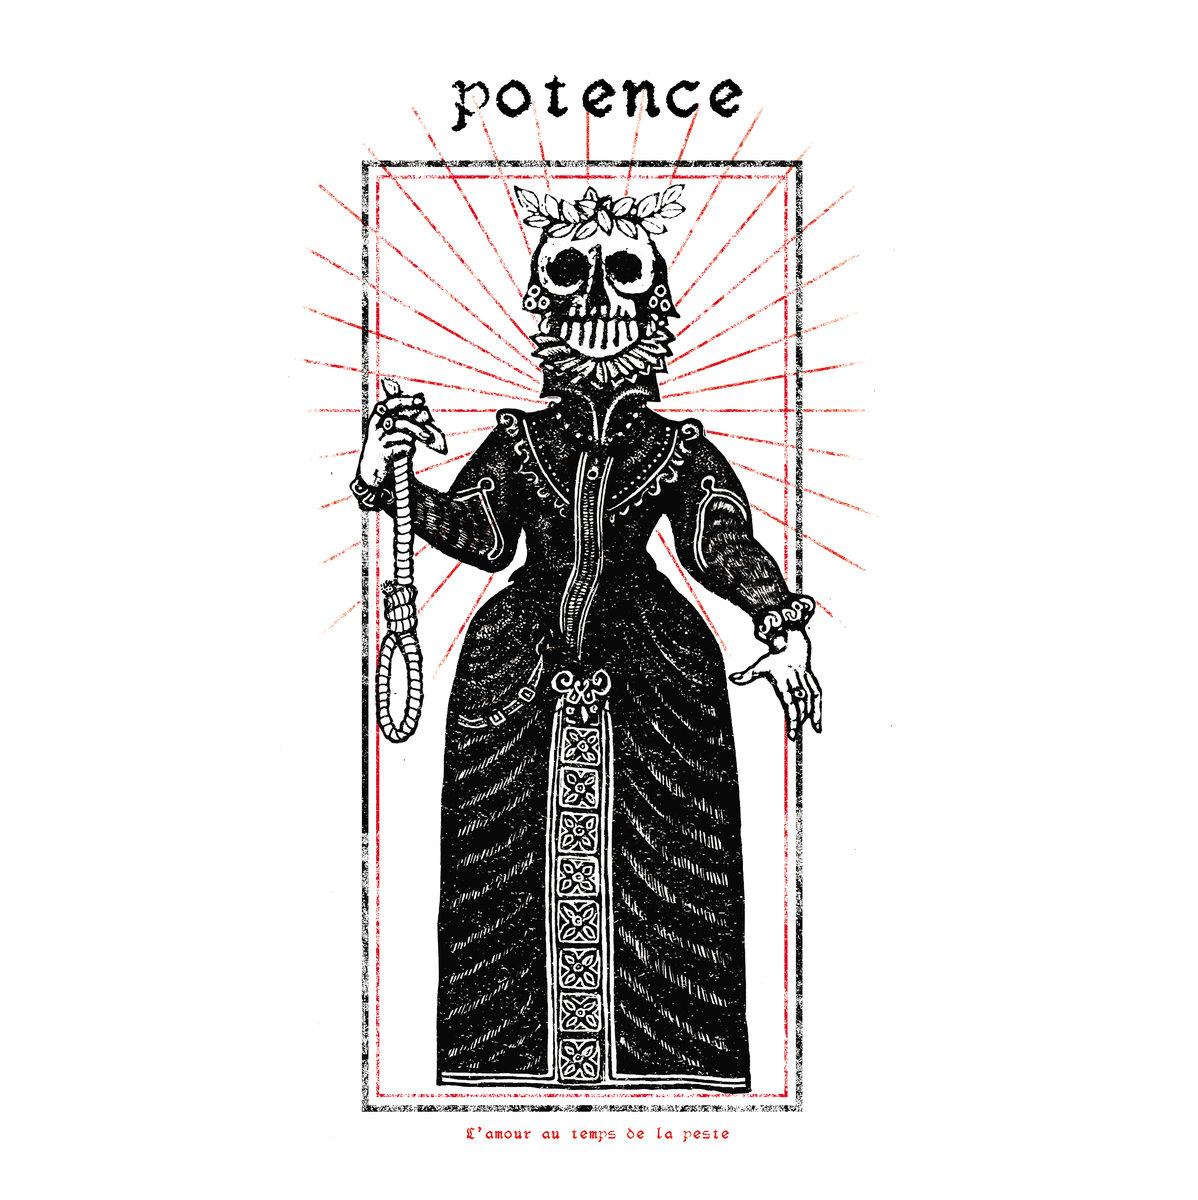 Potence